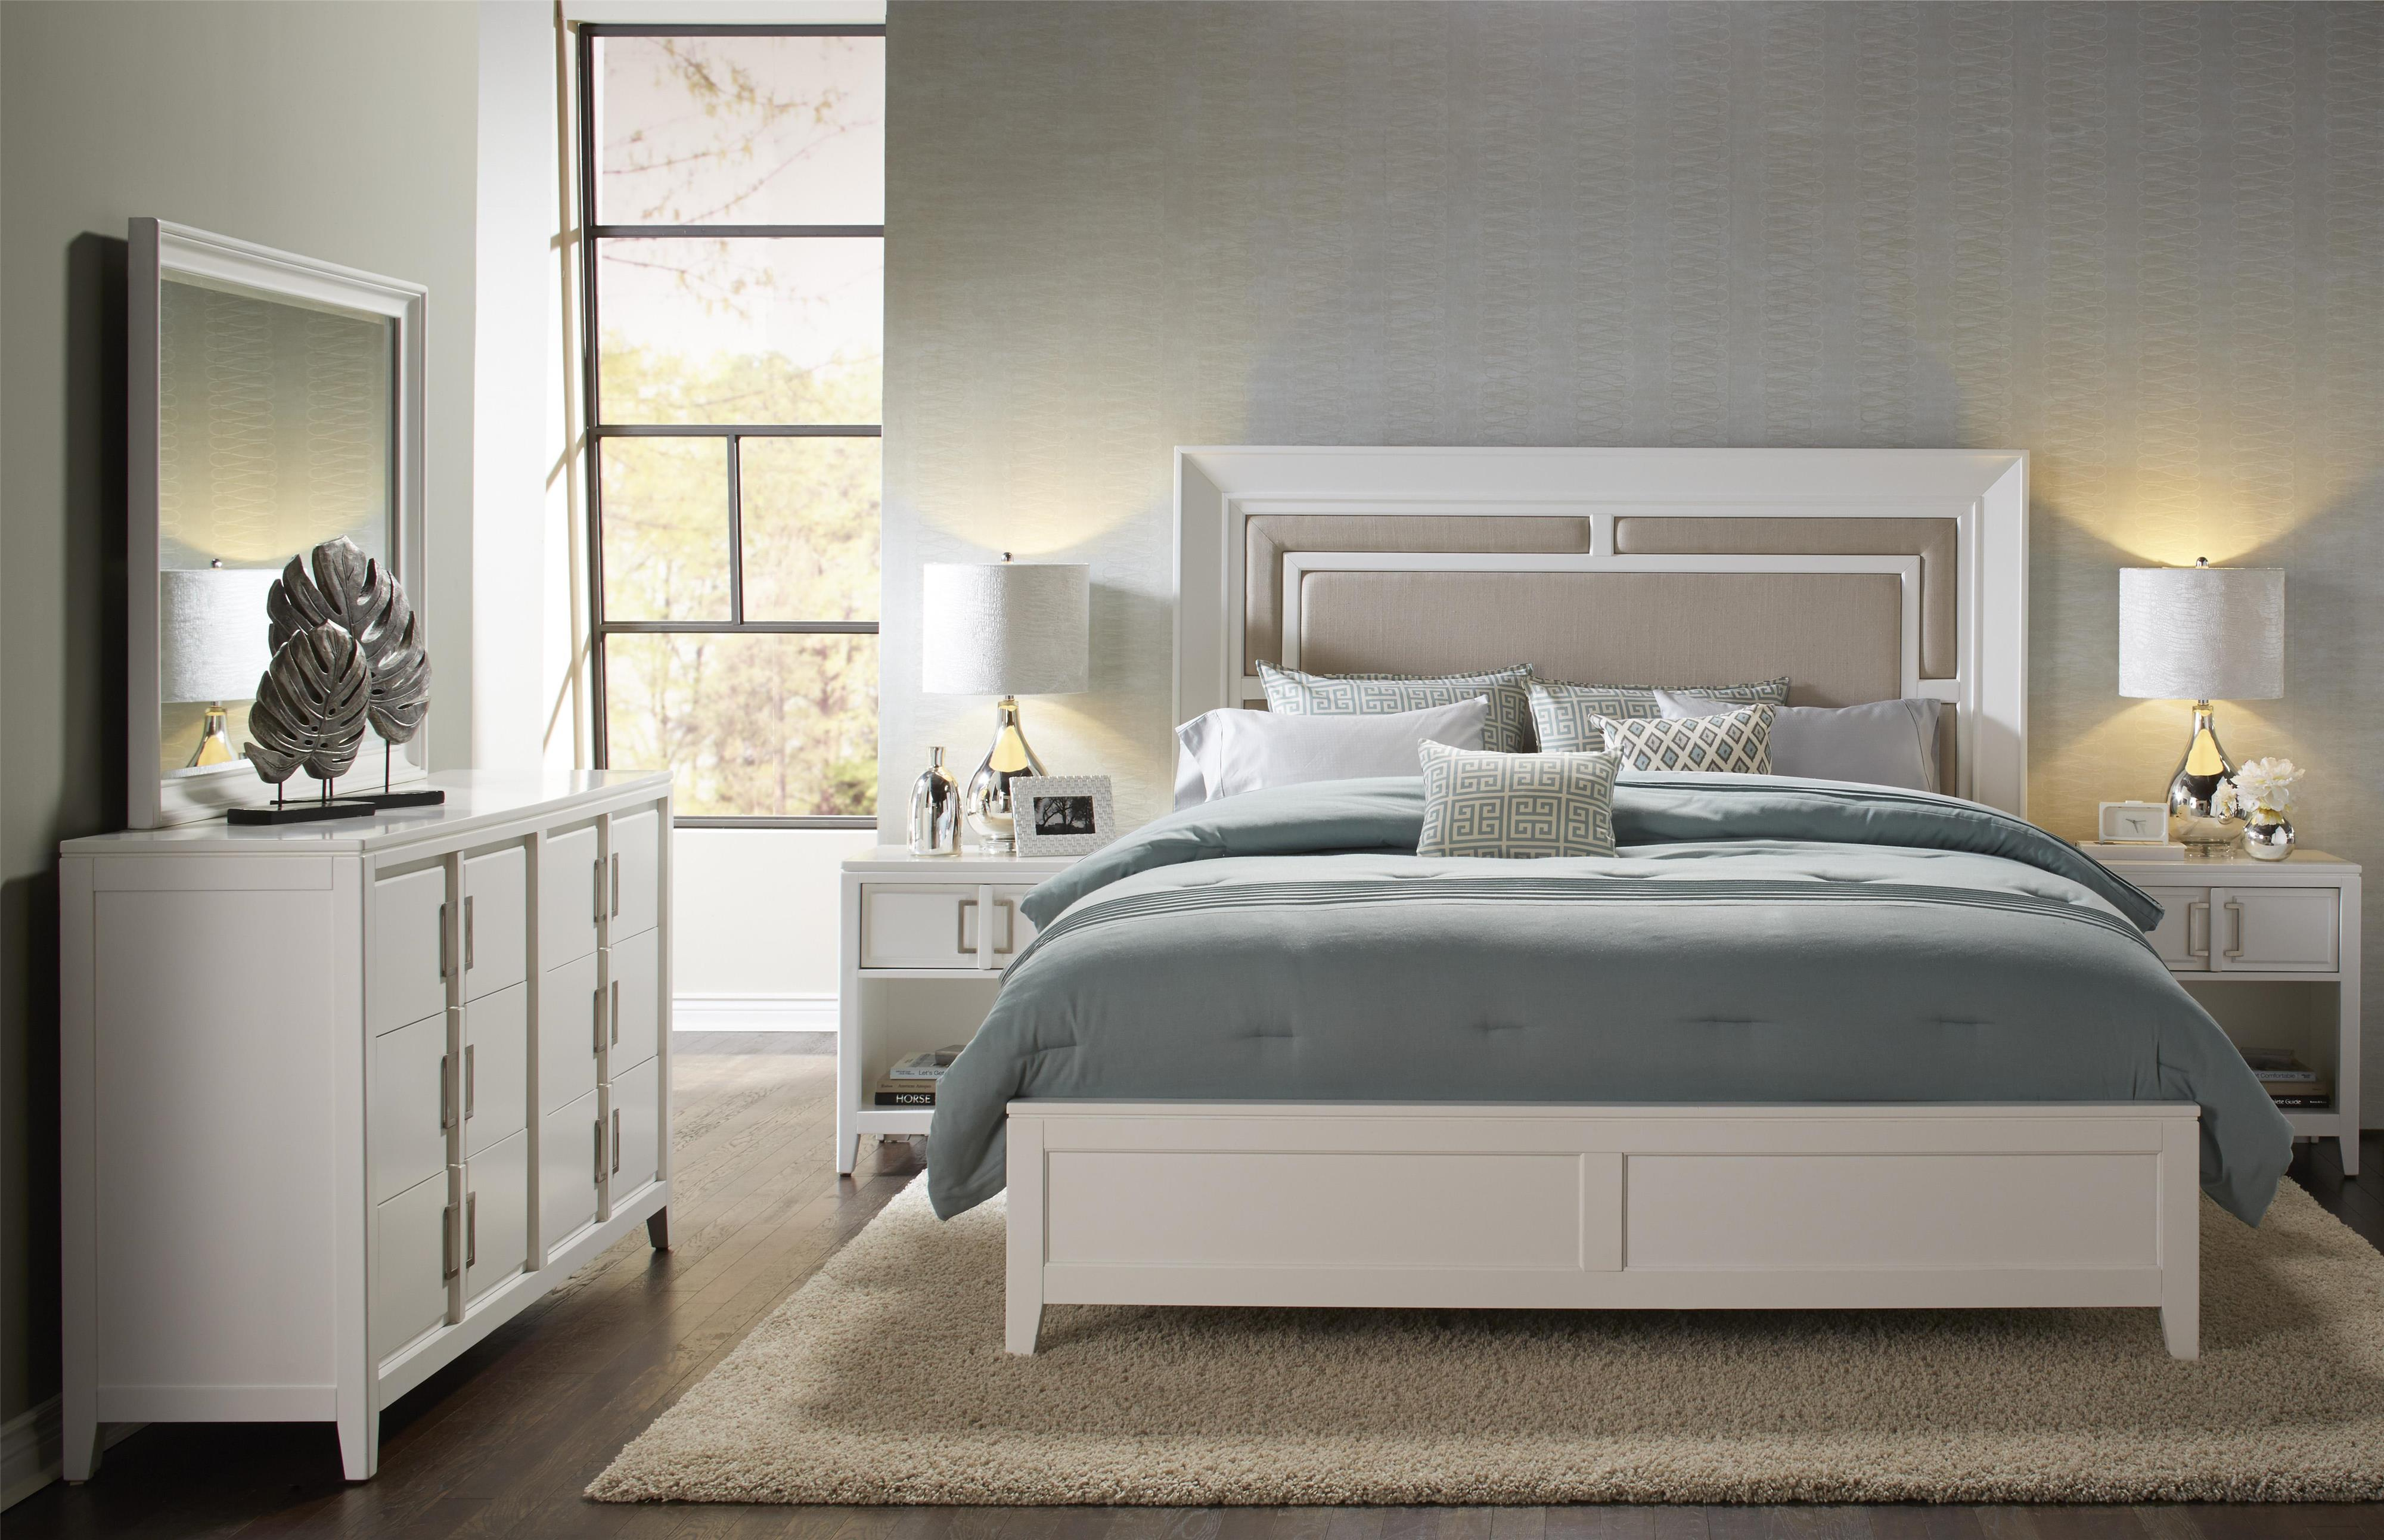 Samuel Lawrence Brighton King Bedroom Group - Item Number: 8673 K Bedroom Group 1